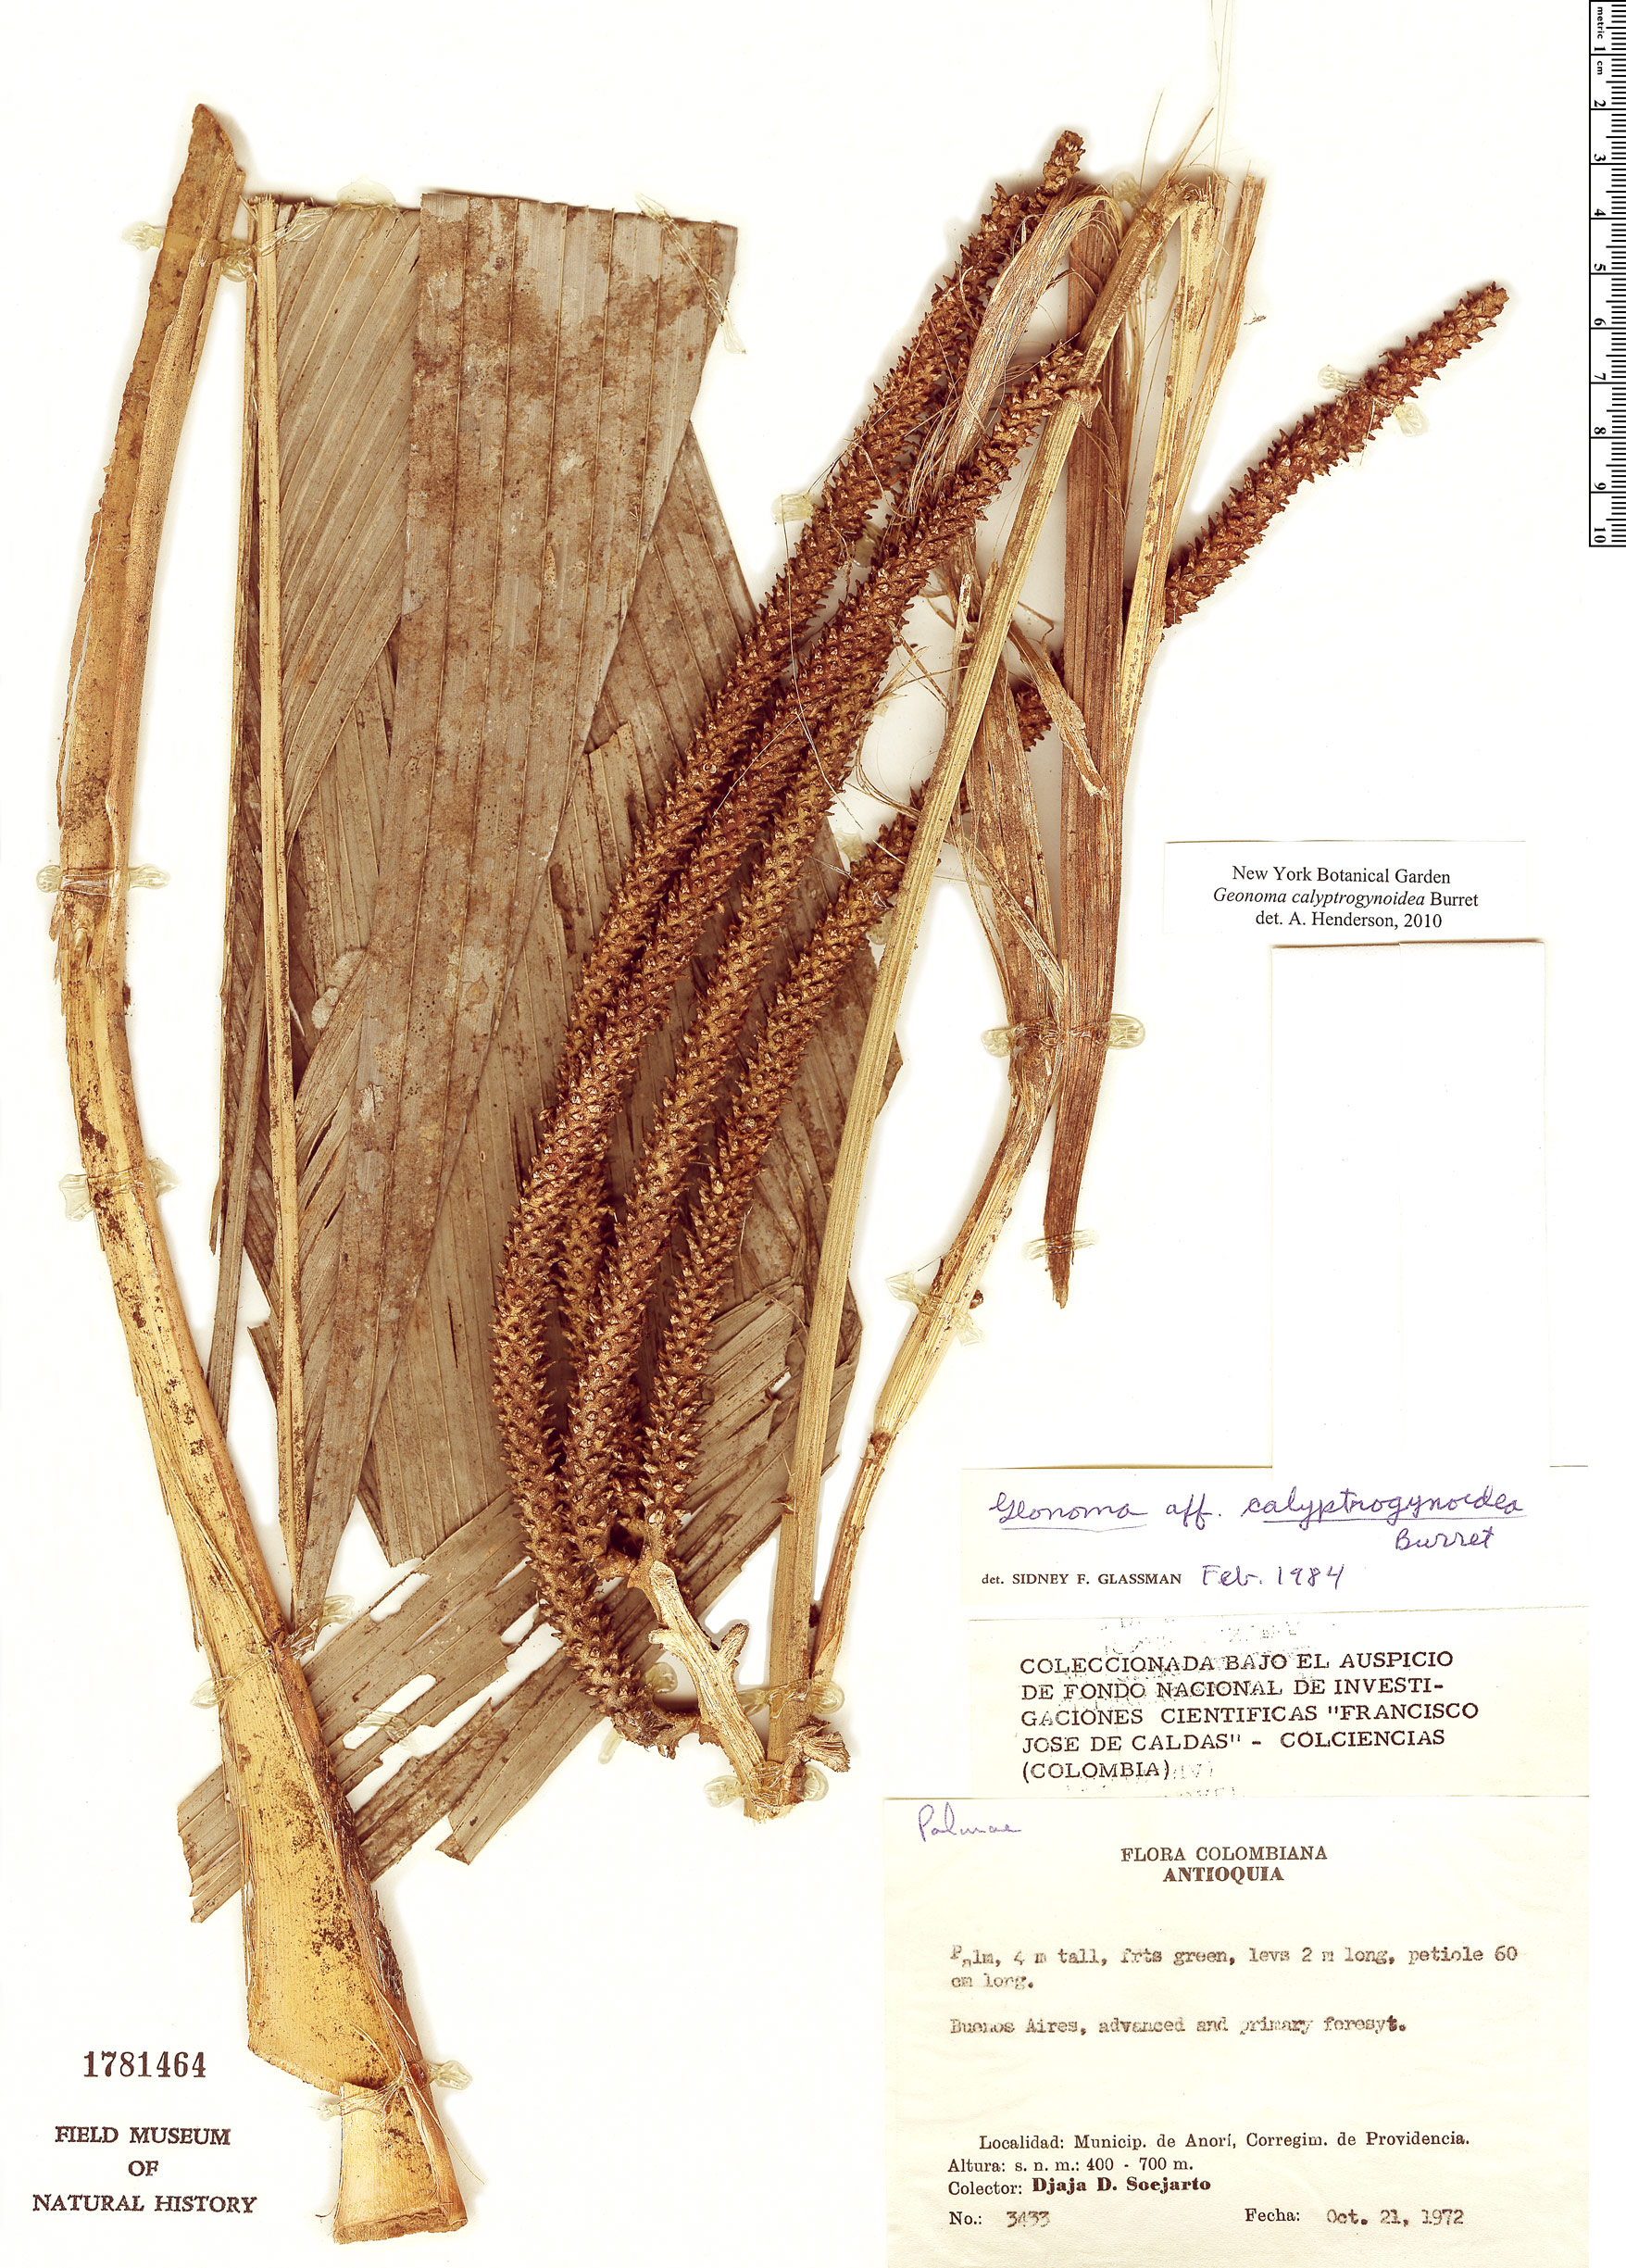 Specimen: Geonoma calyptrogynoidea